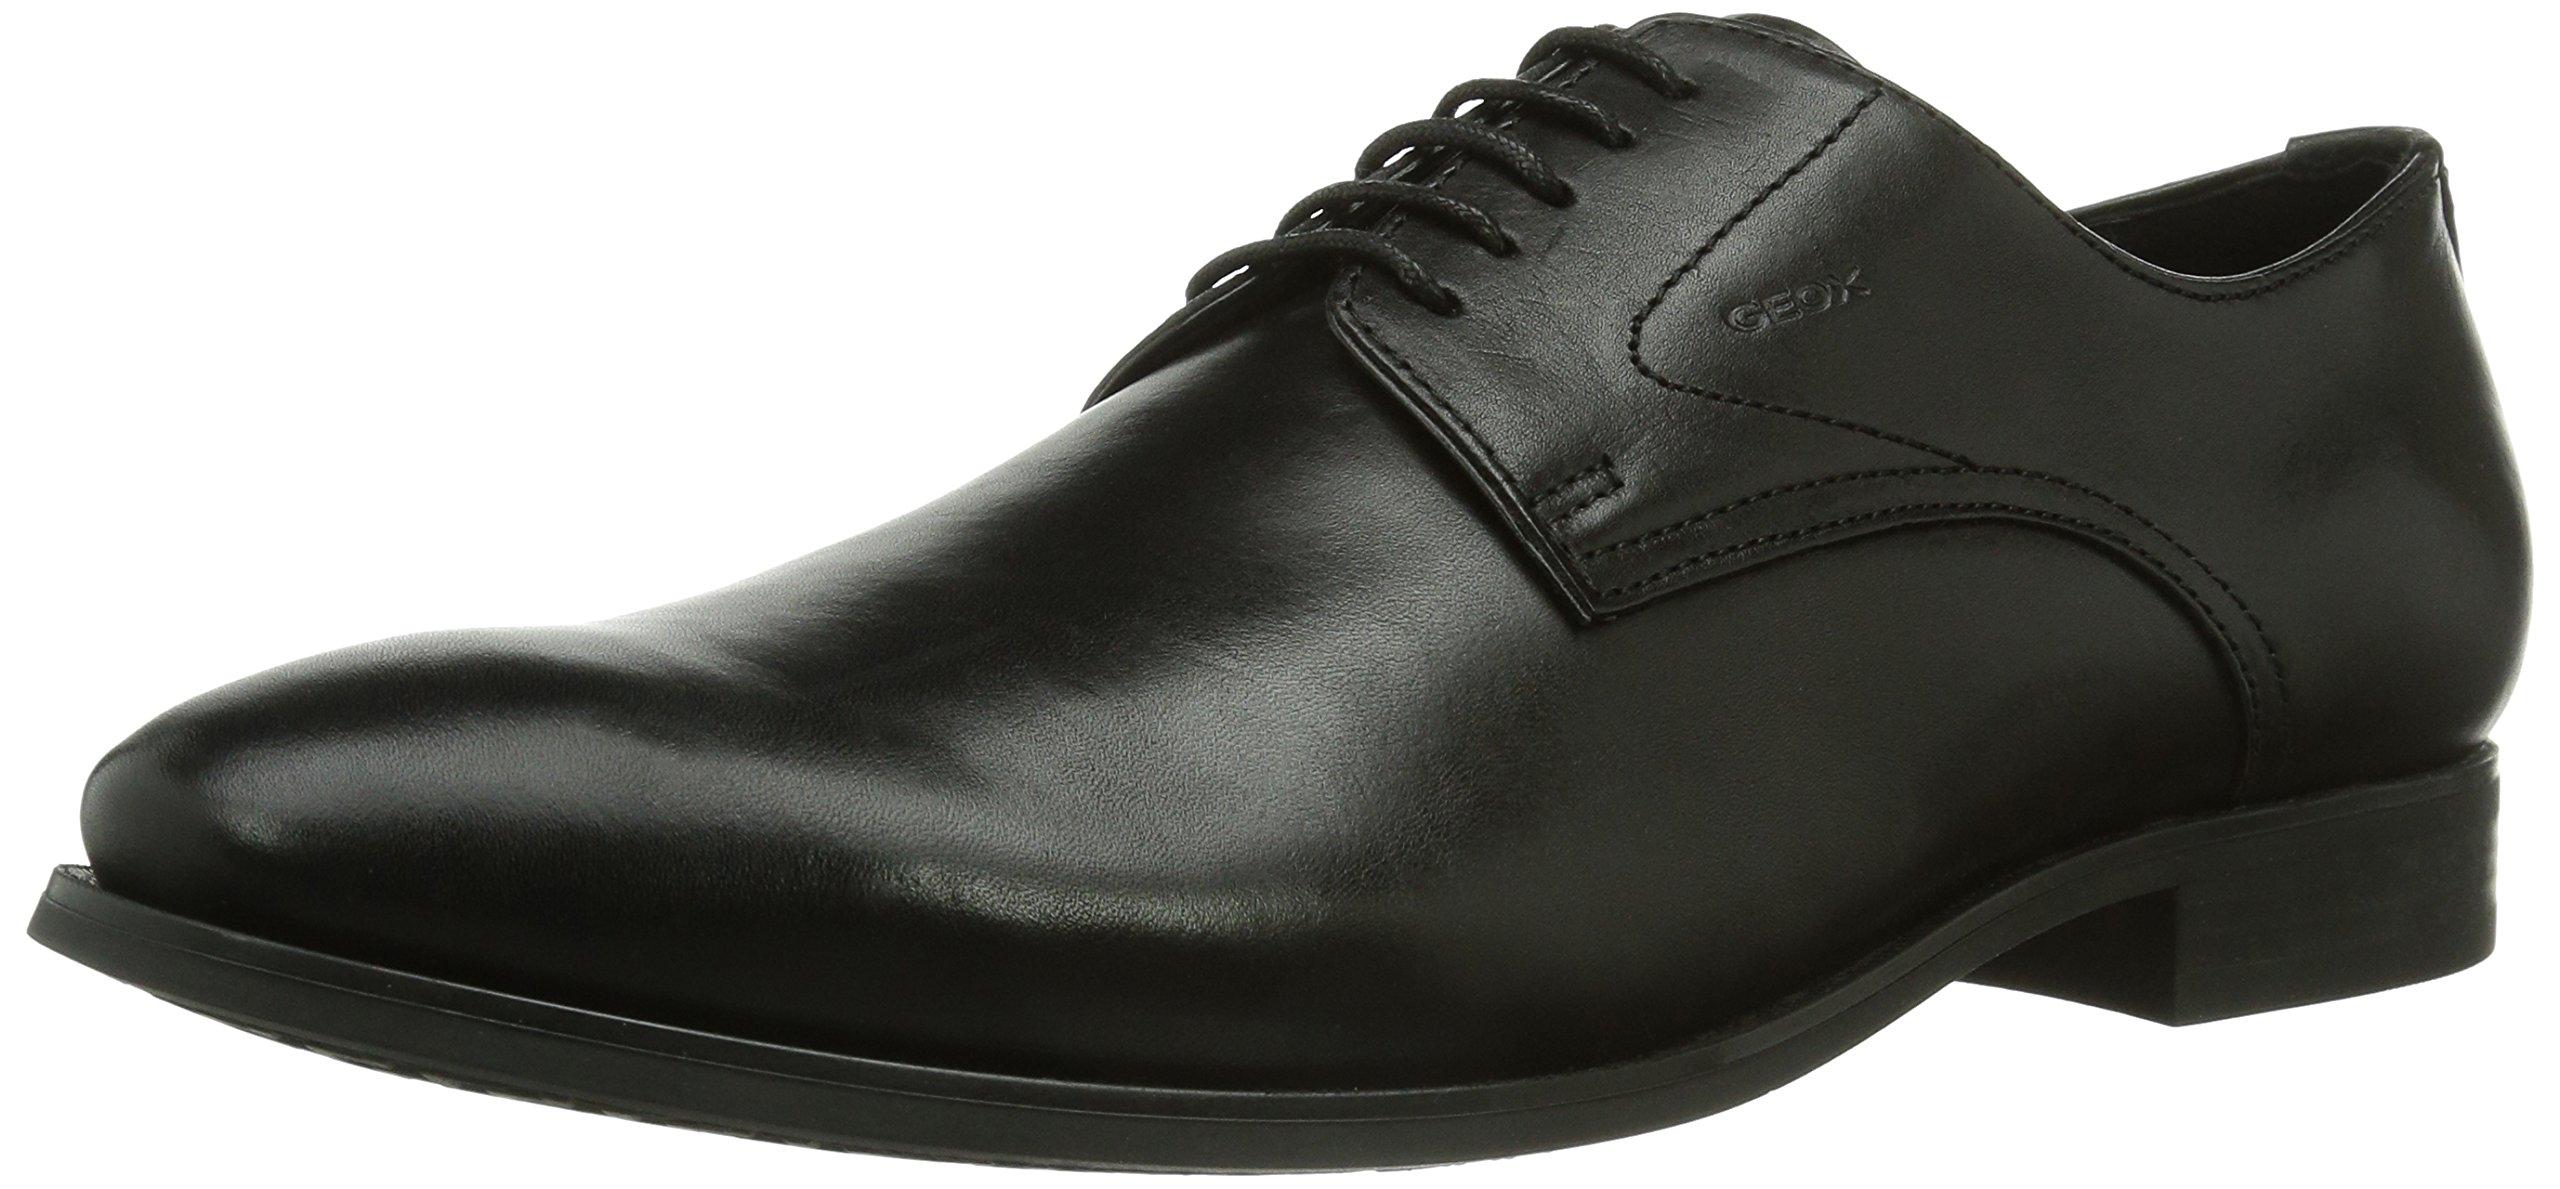 Geox Men's U Albert 2Fit 5 Black Oxford